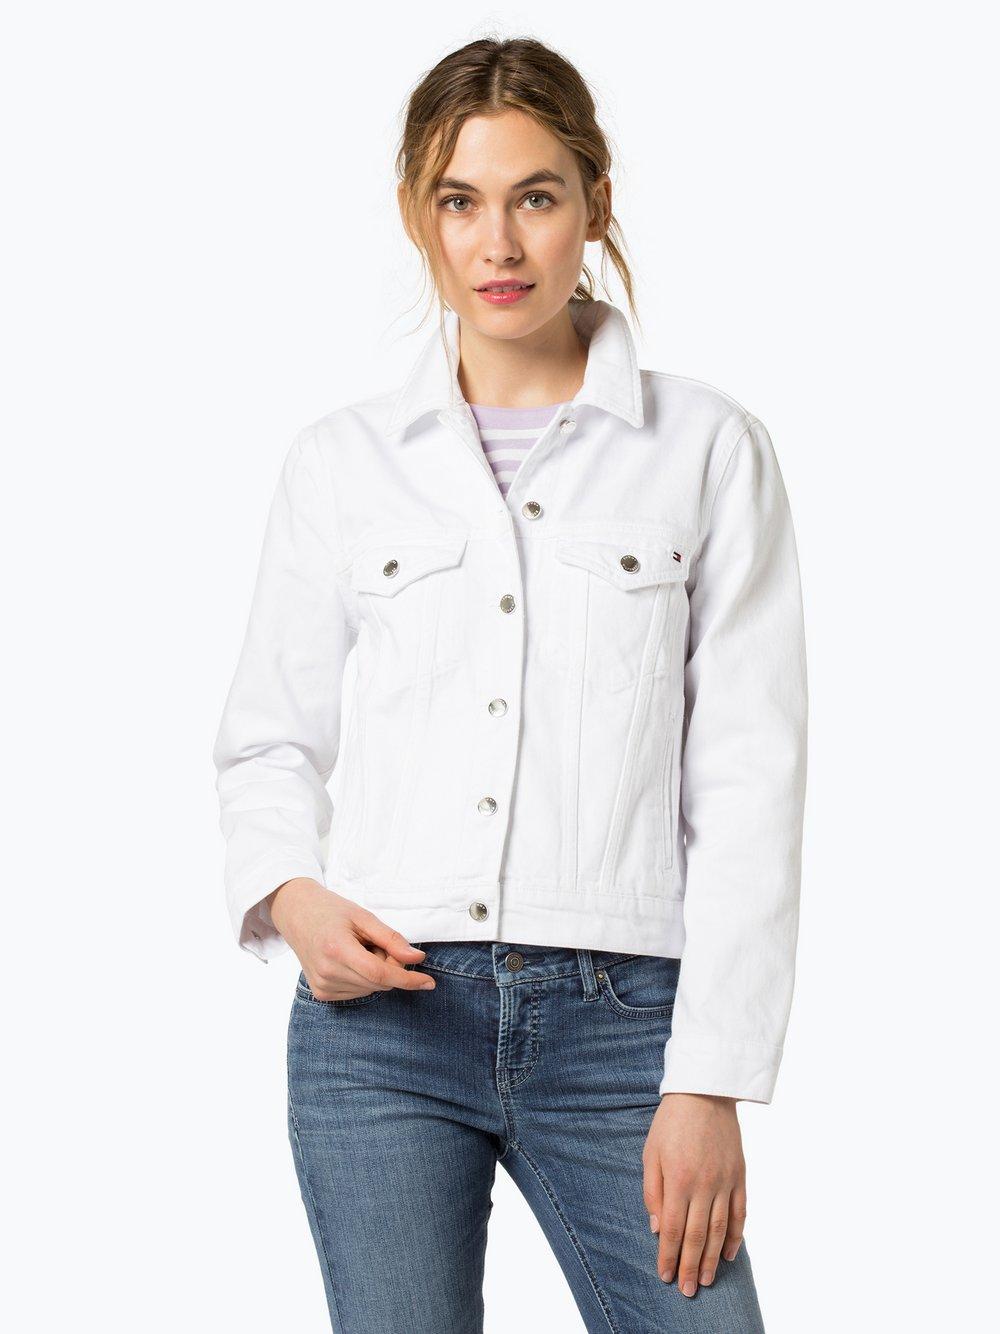 Tommy Hilfiger - Damska kurtka jeansowa – Veronica, biały